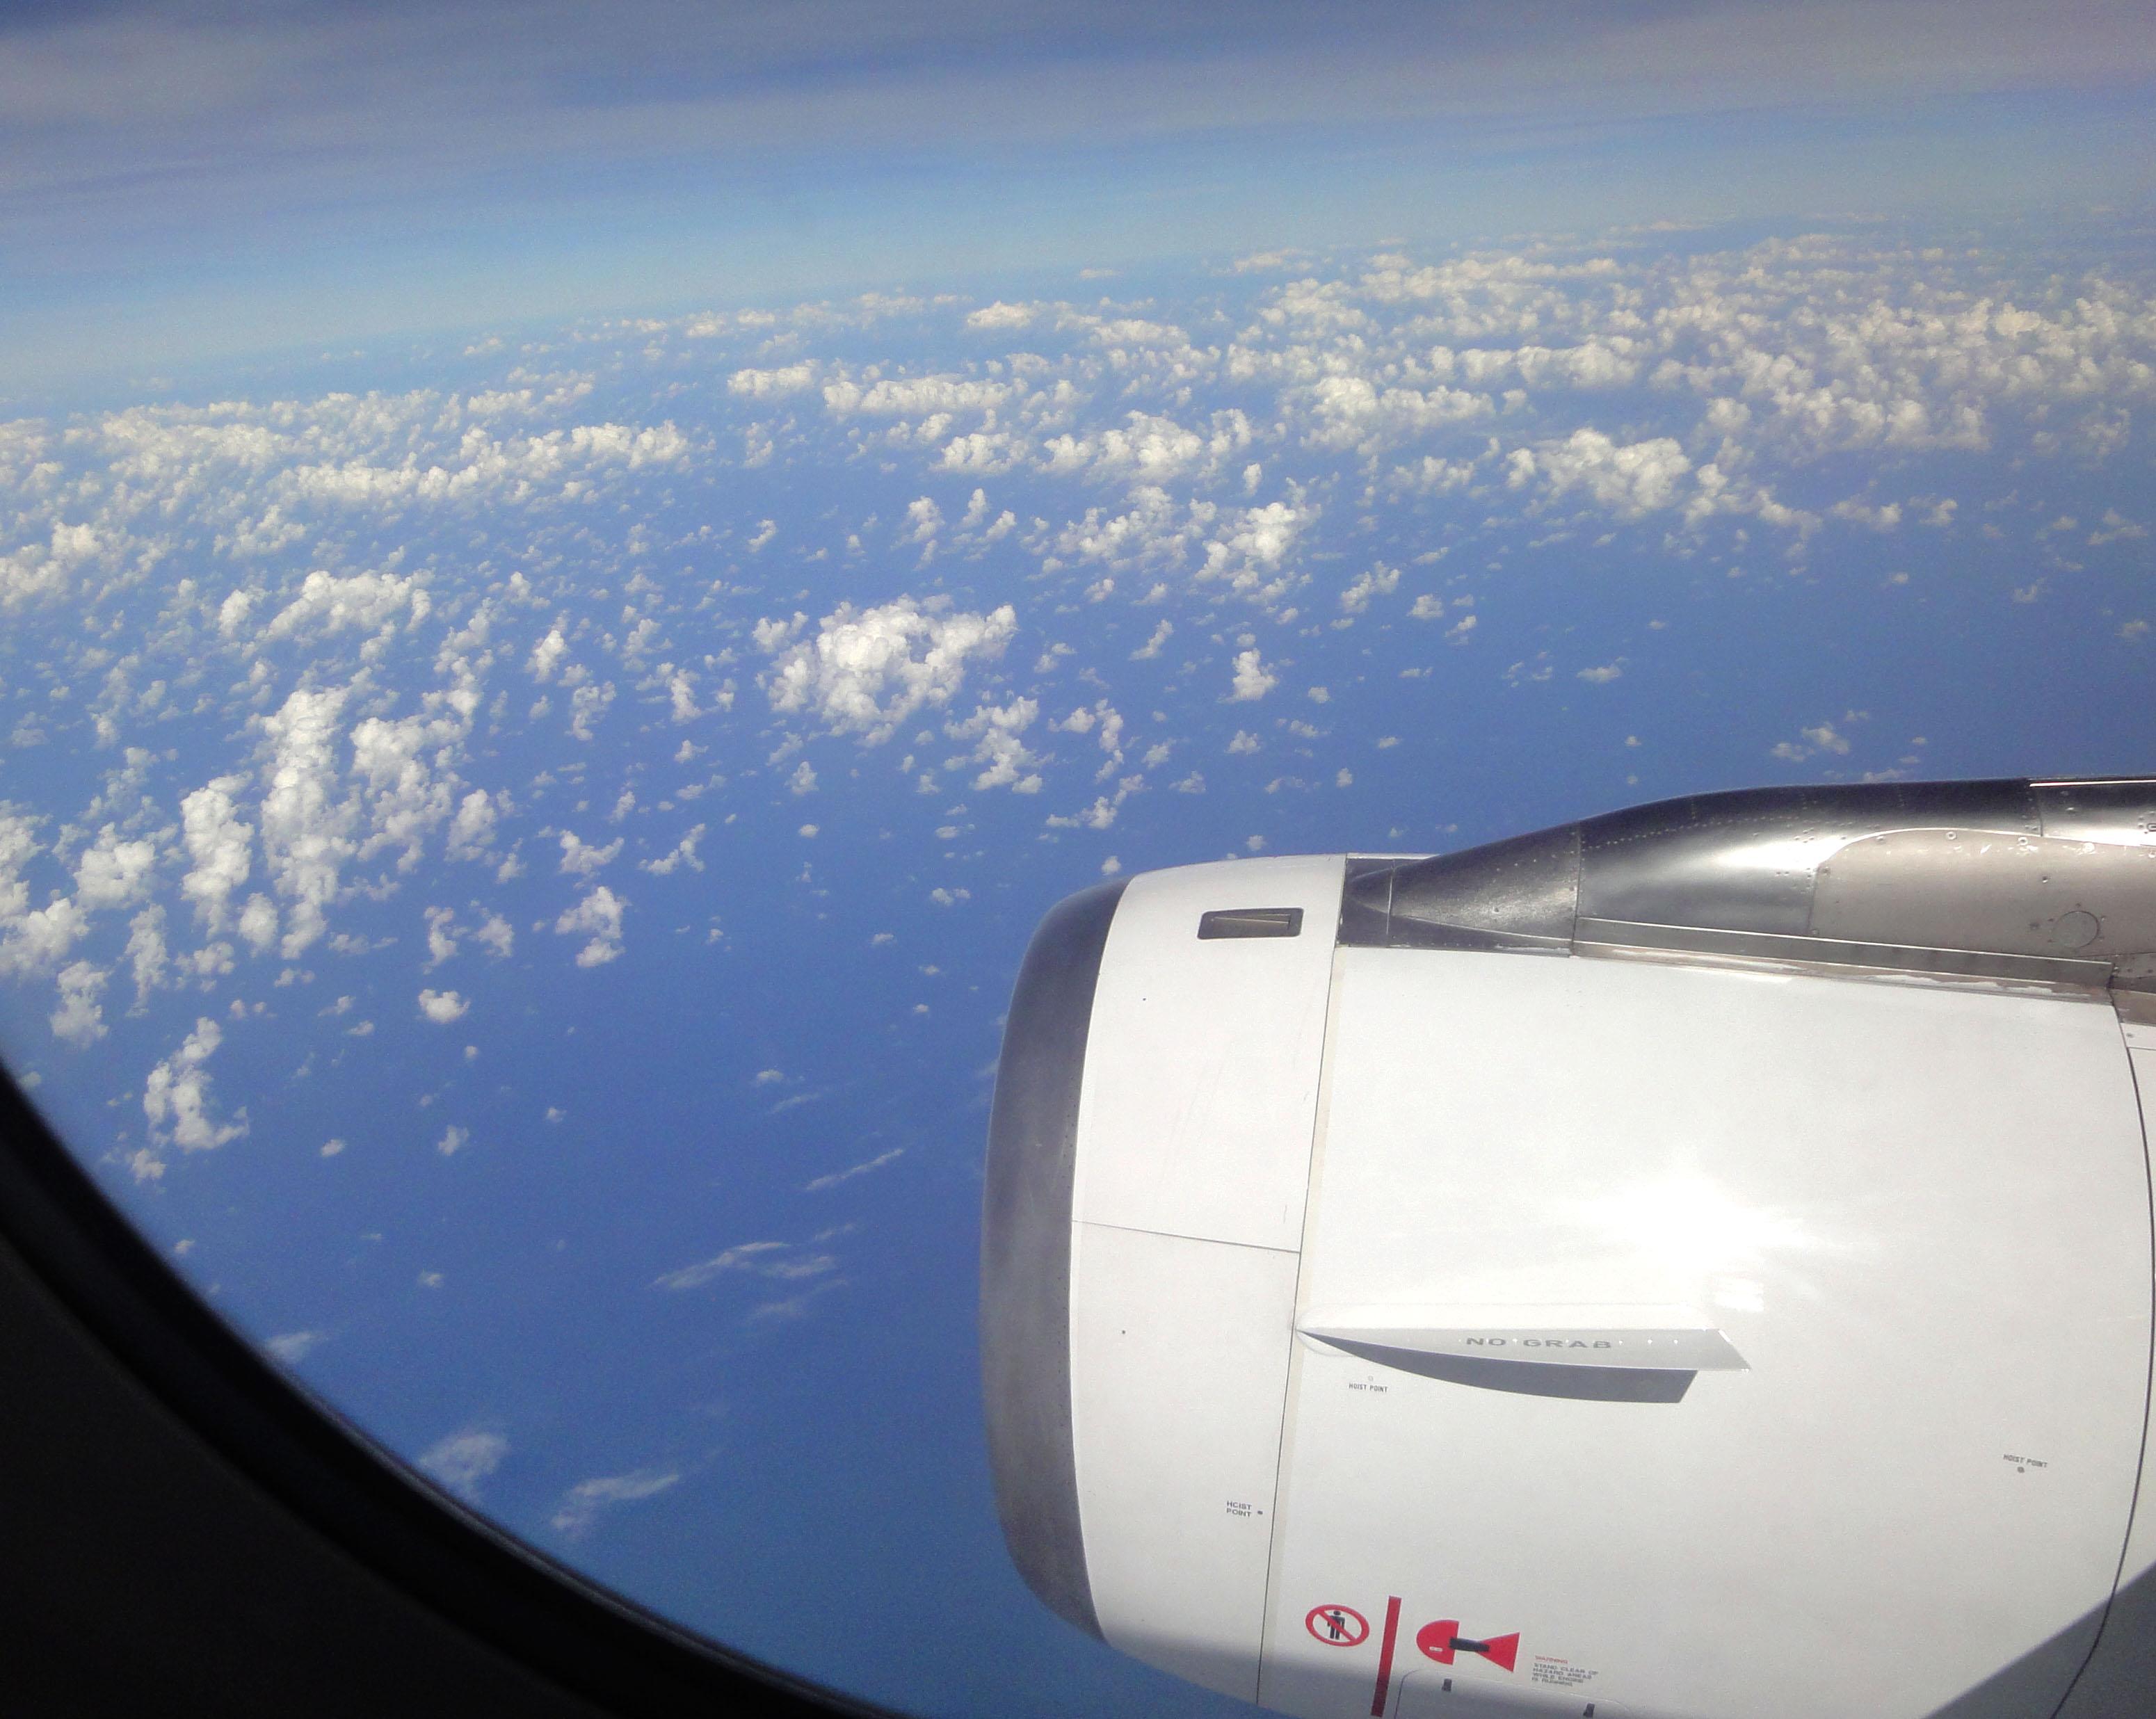 Silk Air flight SIN RGN IATA RGN over Malaysian airspace 09